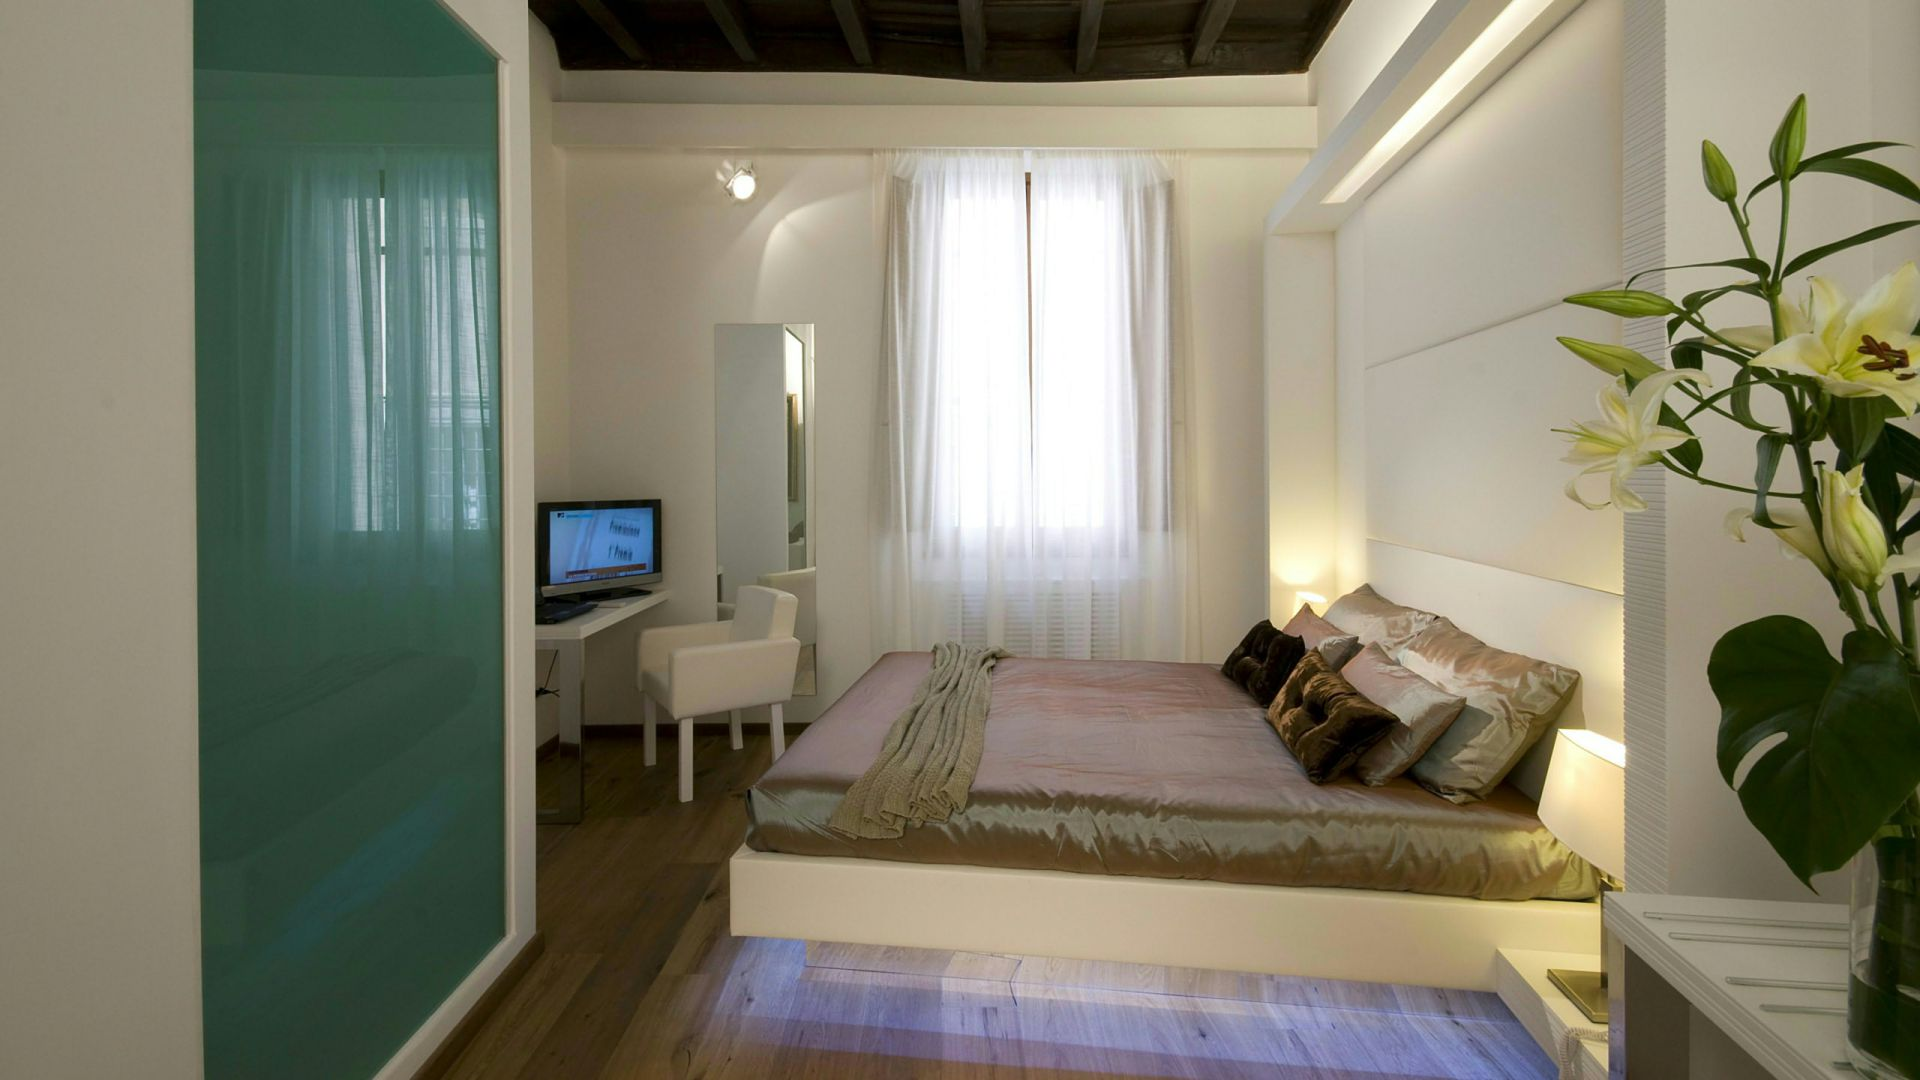 gigli-d-oro-suite-roma-suite-classic-1